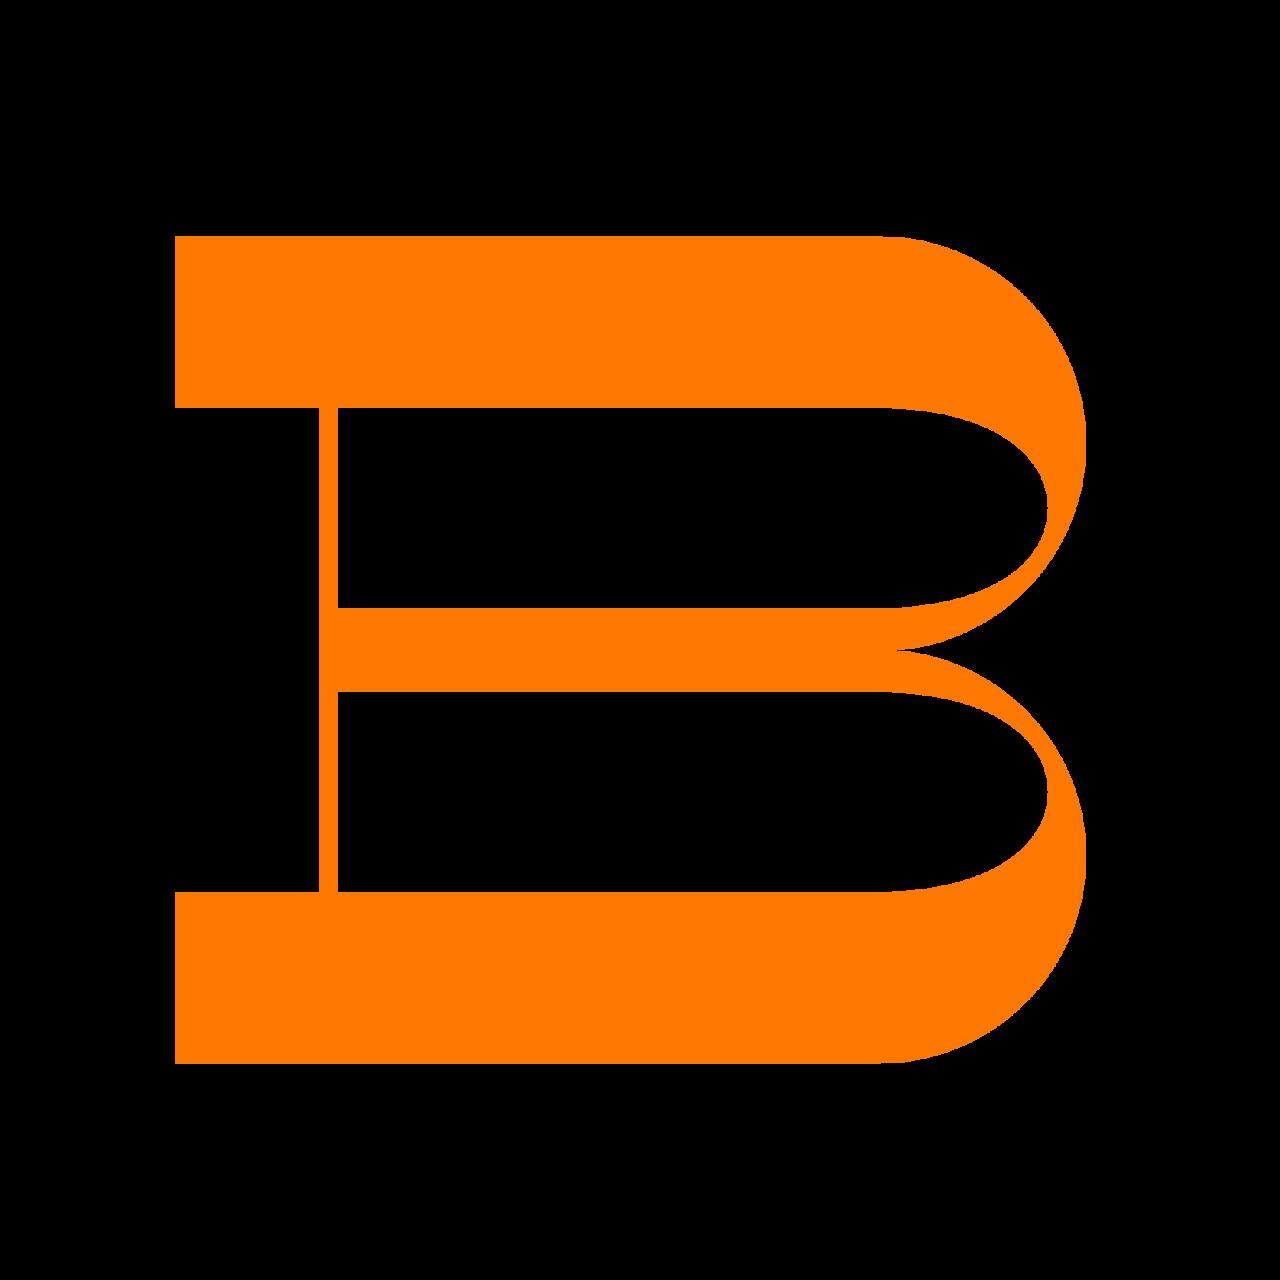 PAULINE BAUMBERGER b